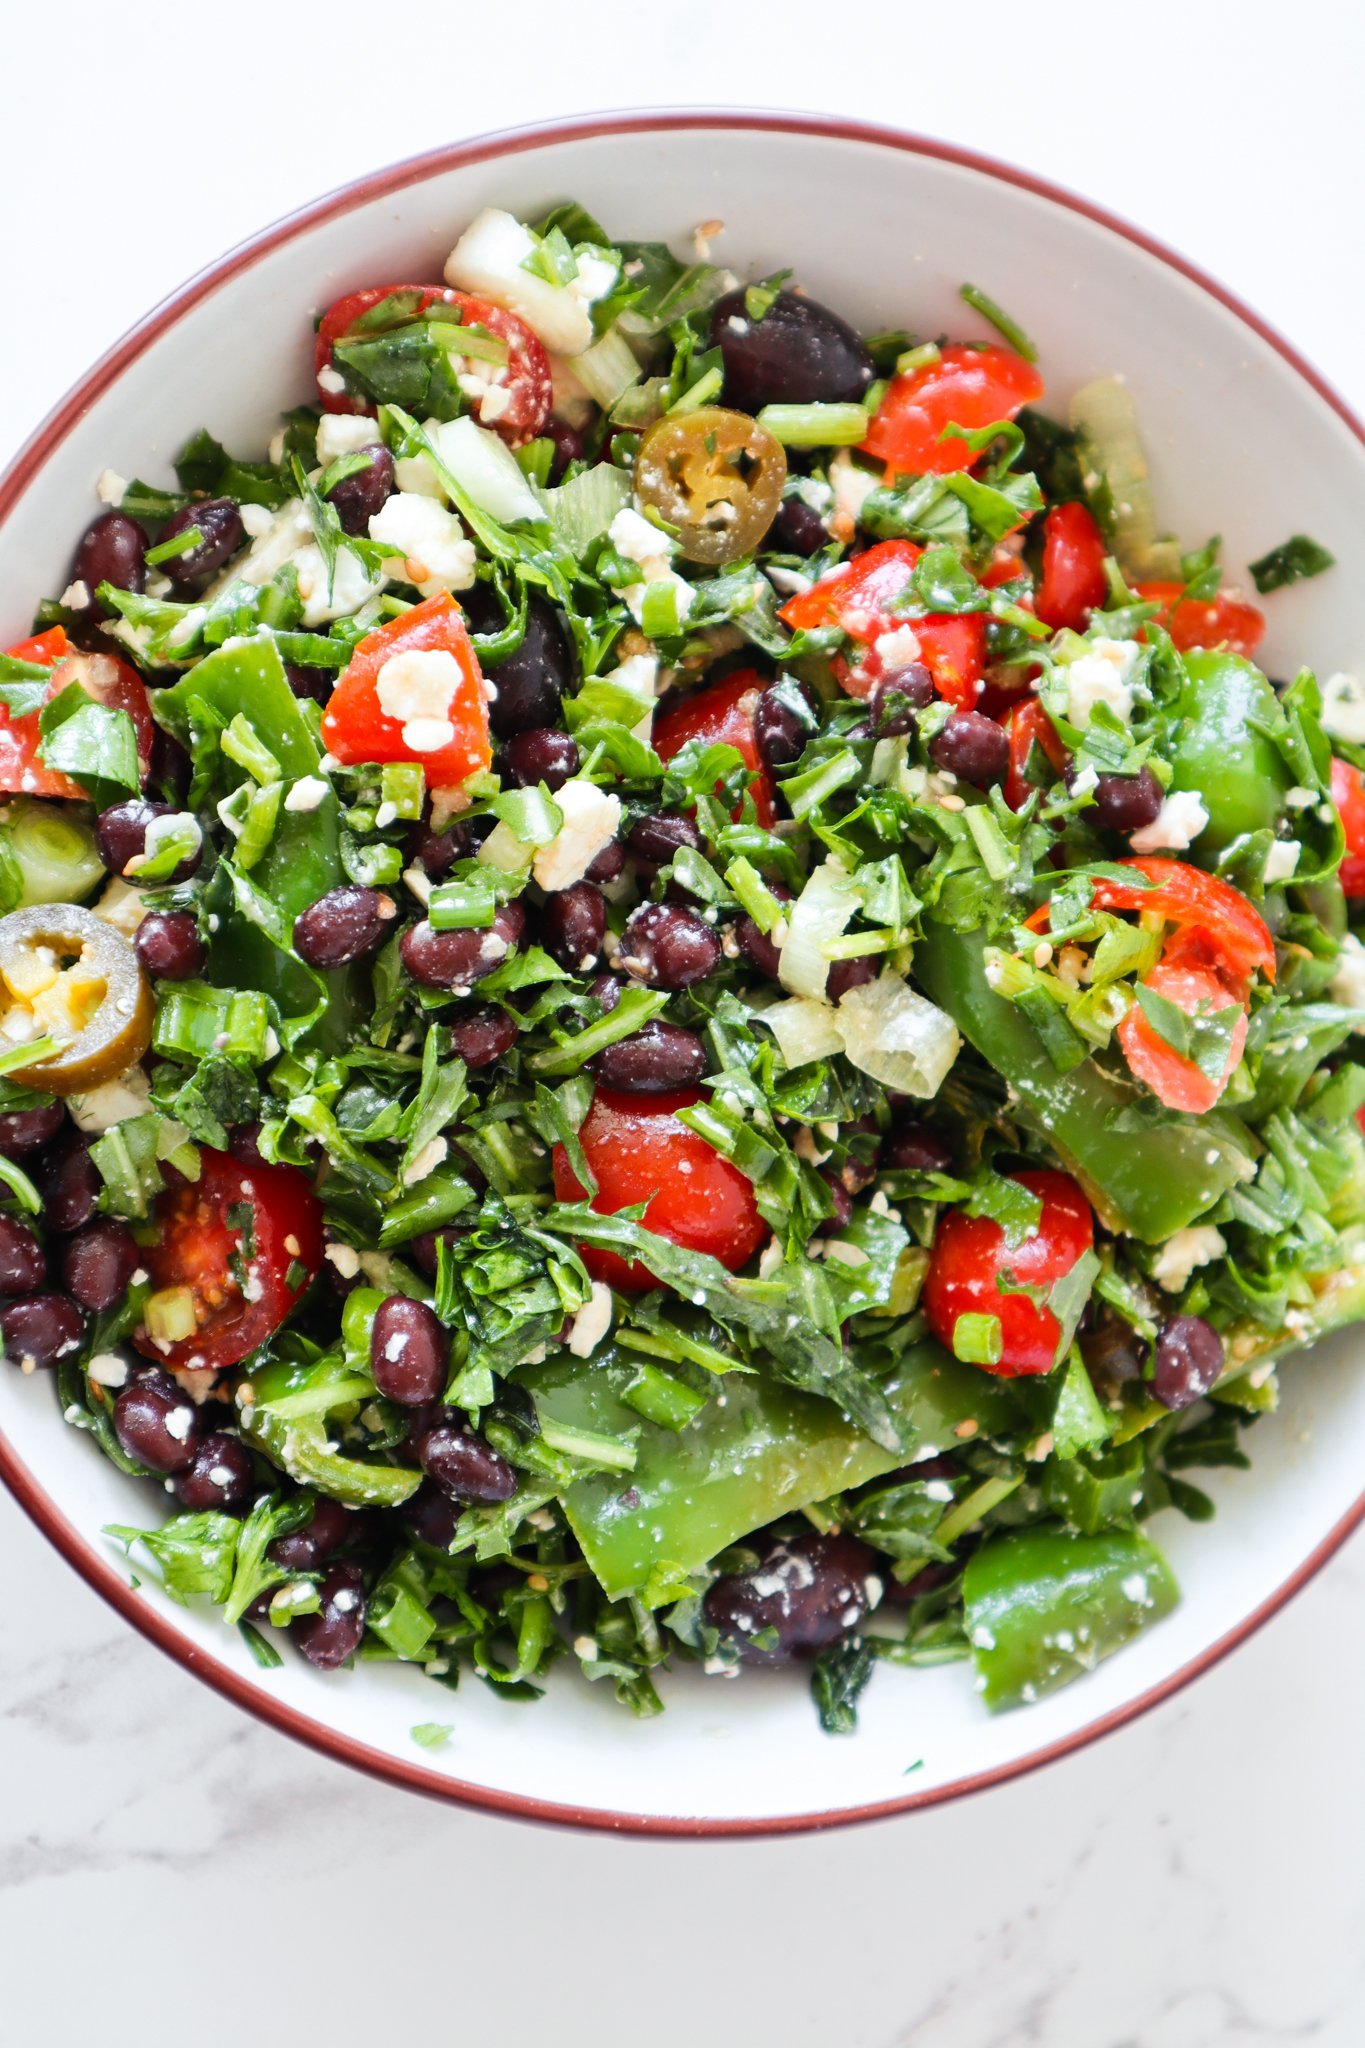 Mediterranean Black bean salad with feta cheese and herbs